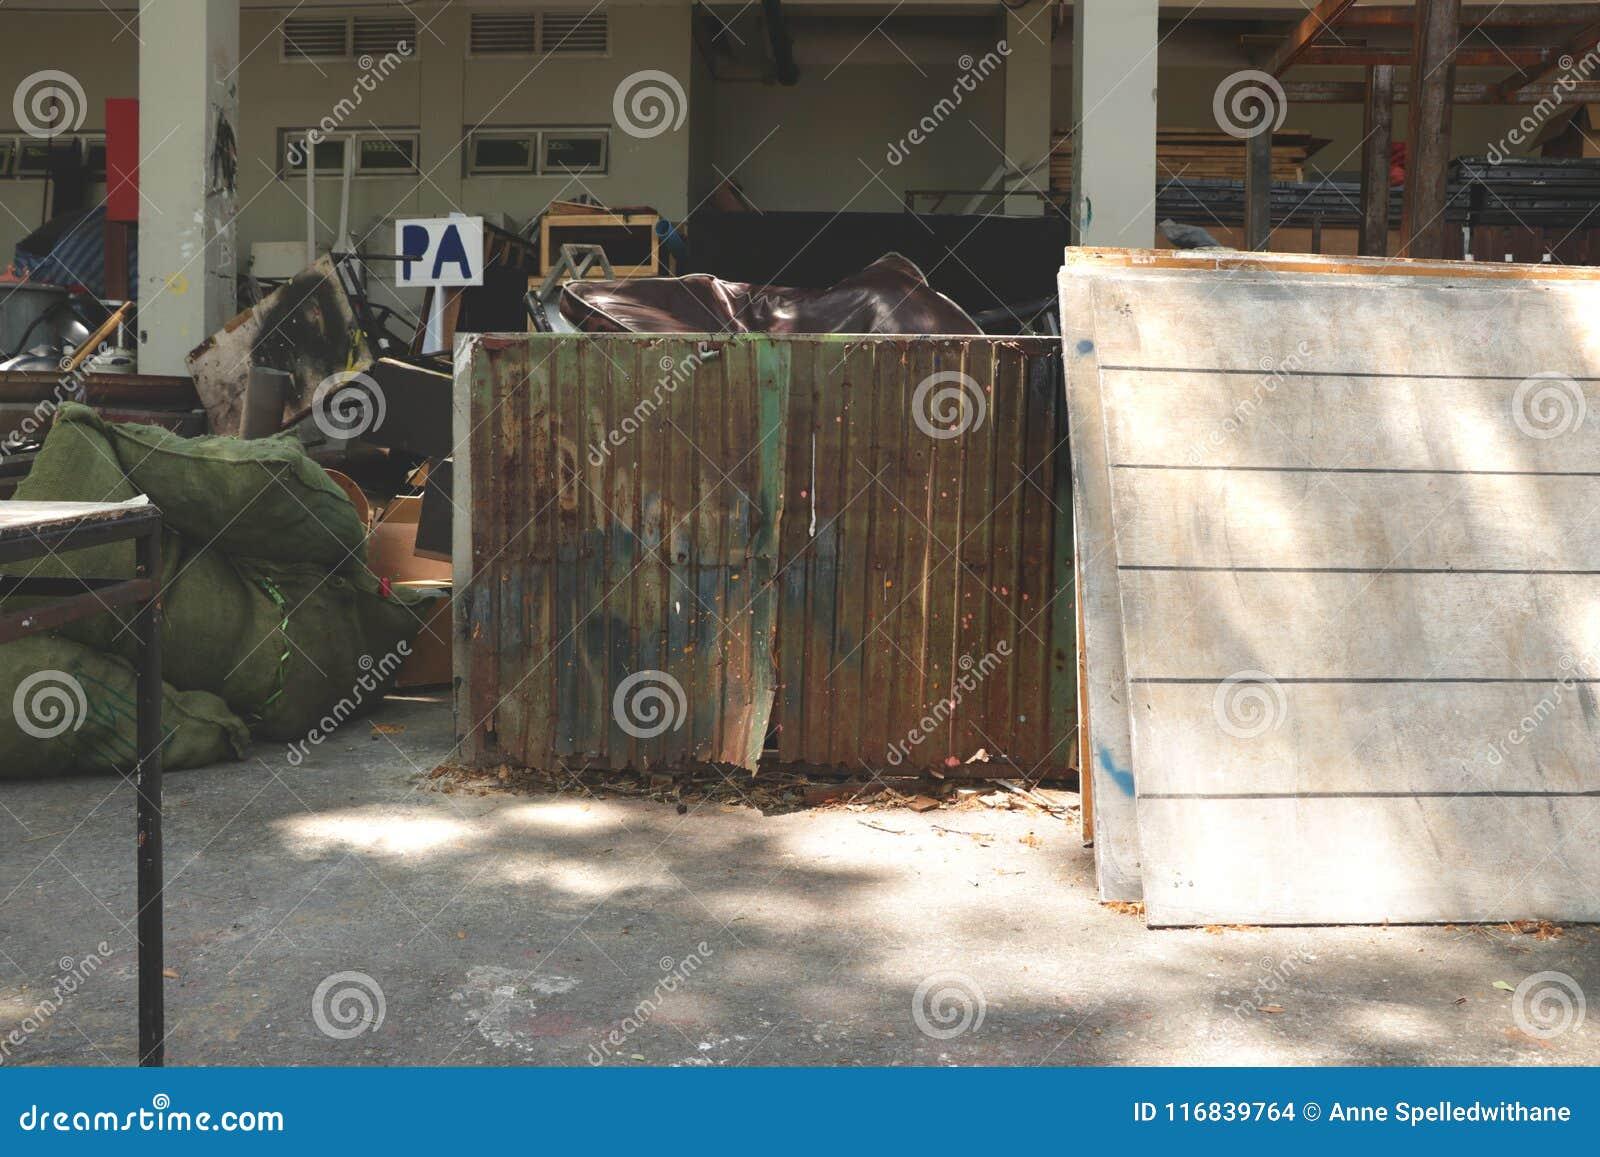 Messy Outdoor Studio Garage Backyard Junkyard With Rusty Old Zinc